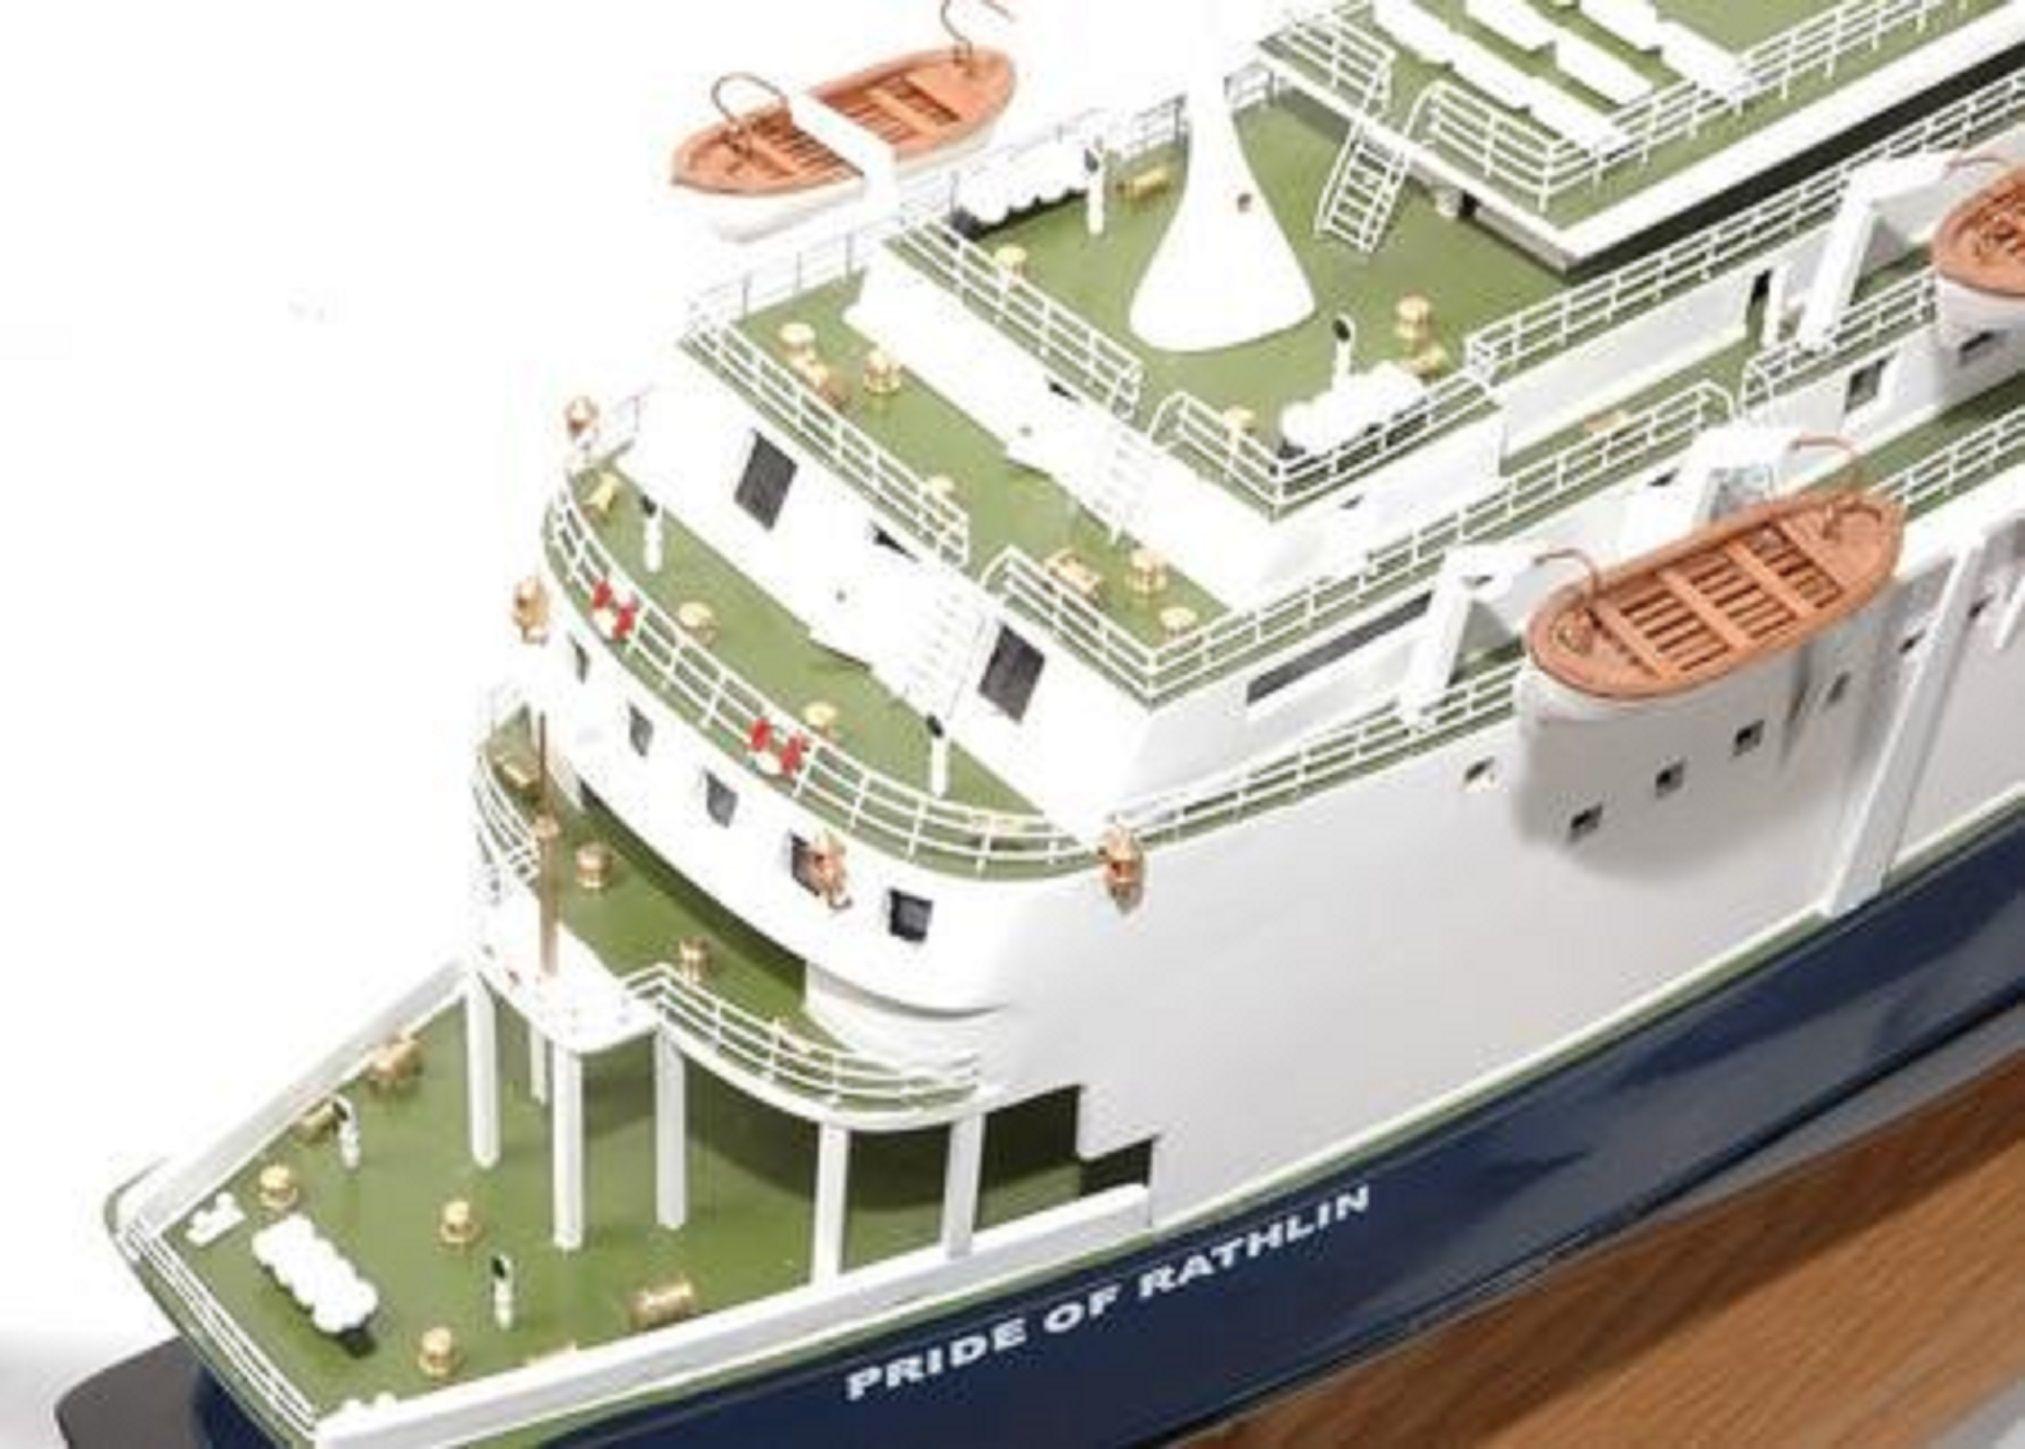 293-7554-P-O-model-ships-Pride-Aisla-and-Rathlin-Premier-Range